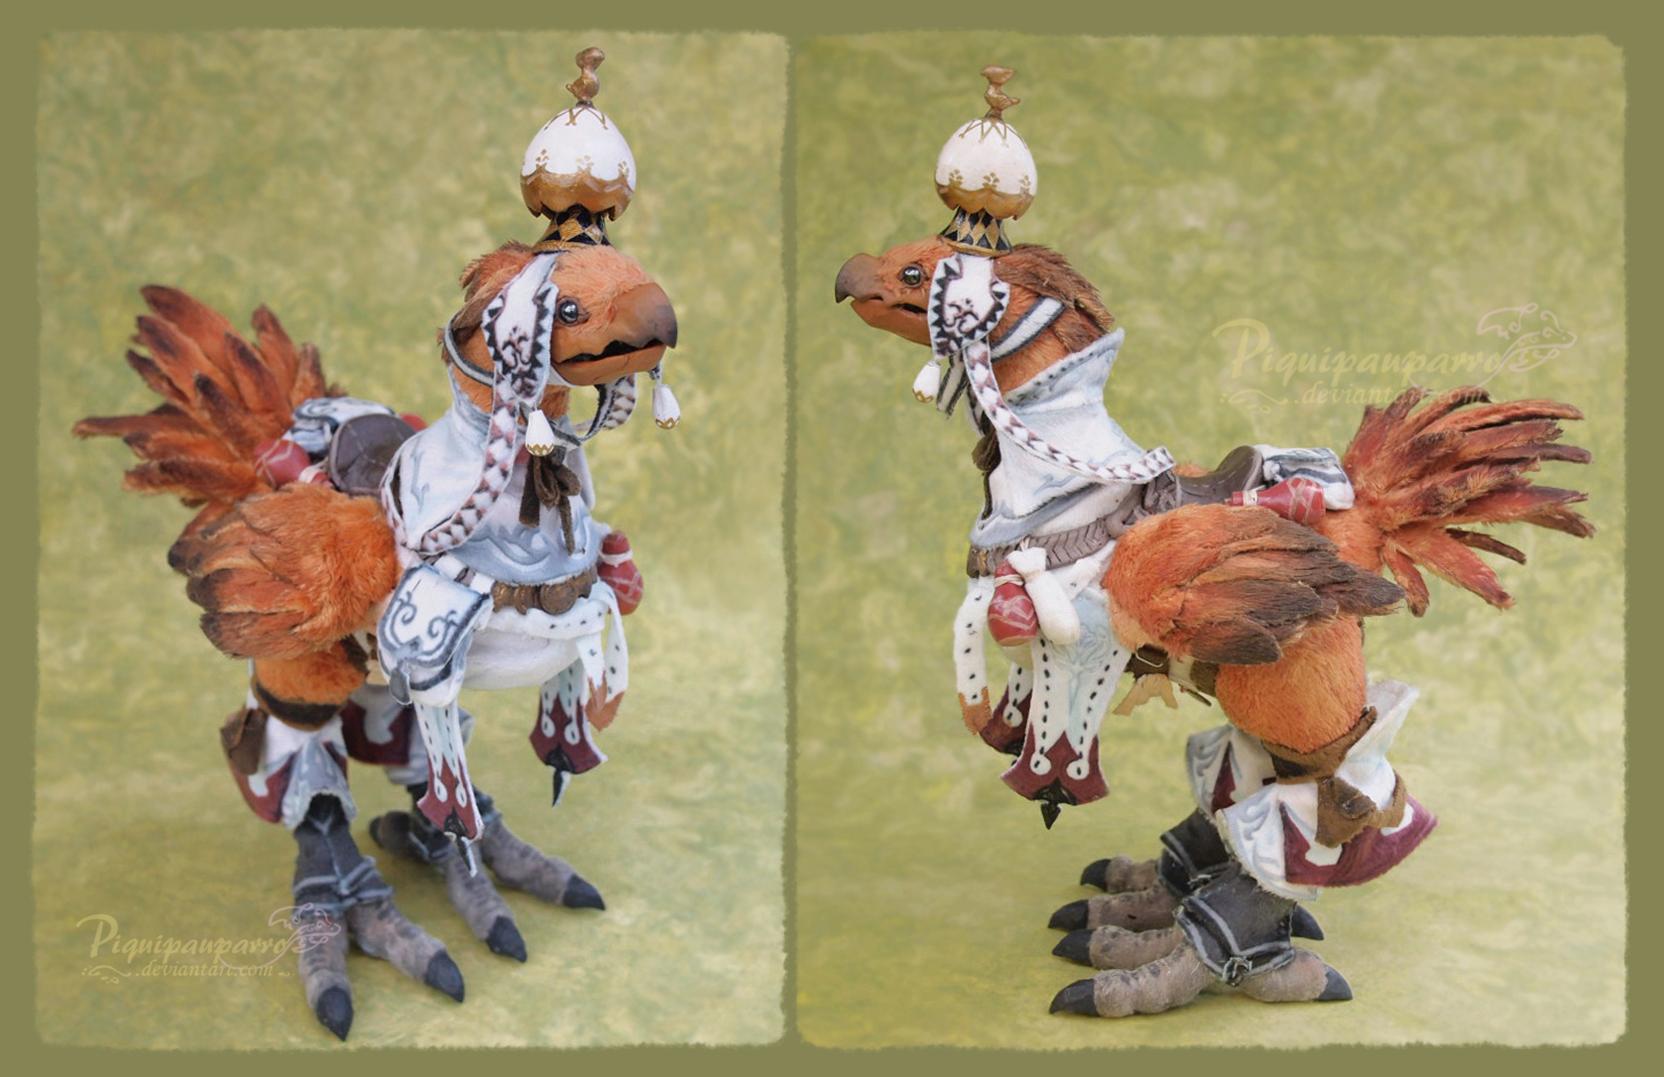 Chocobo XIV - Art doll by Piquipauparro